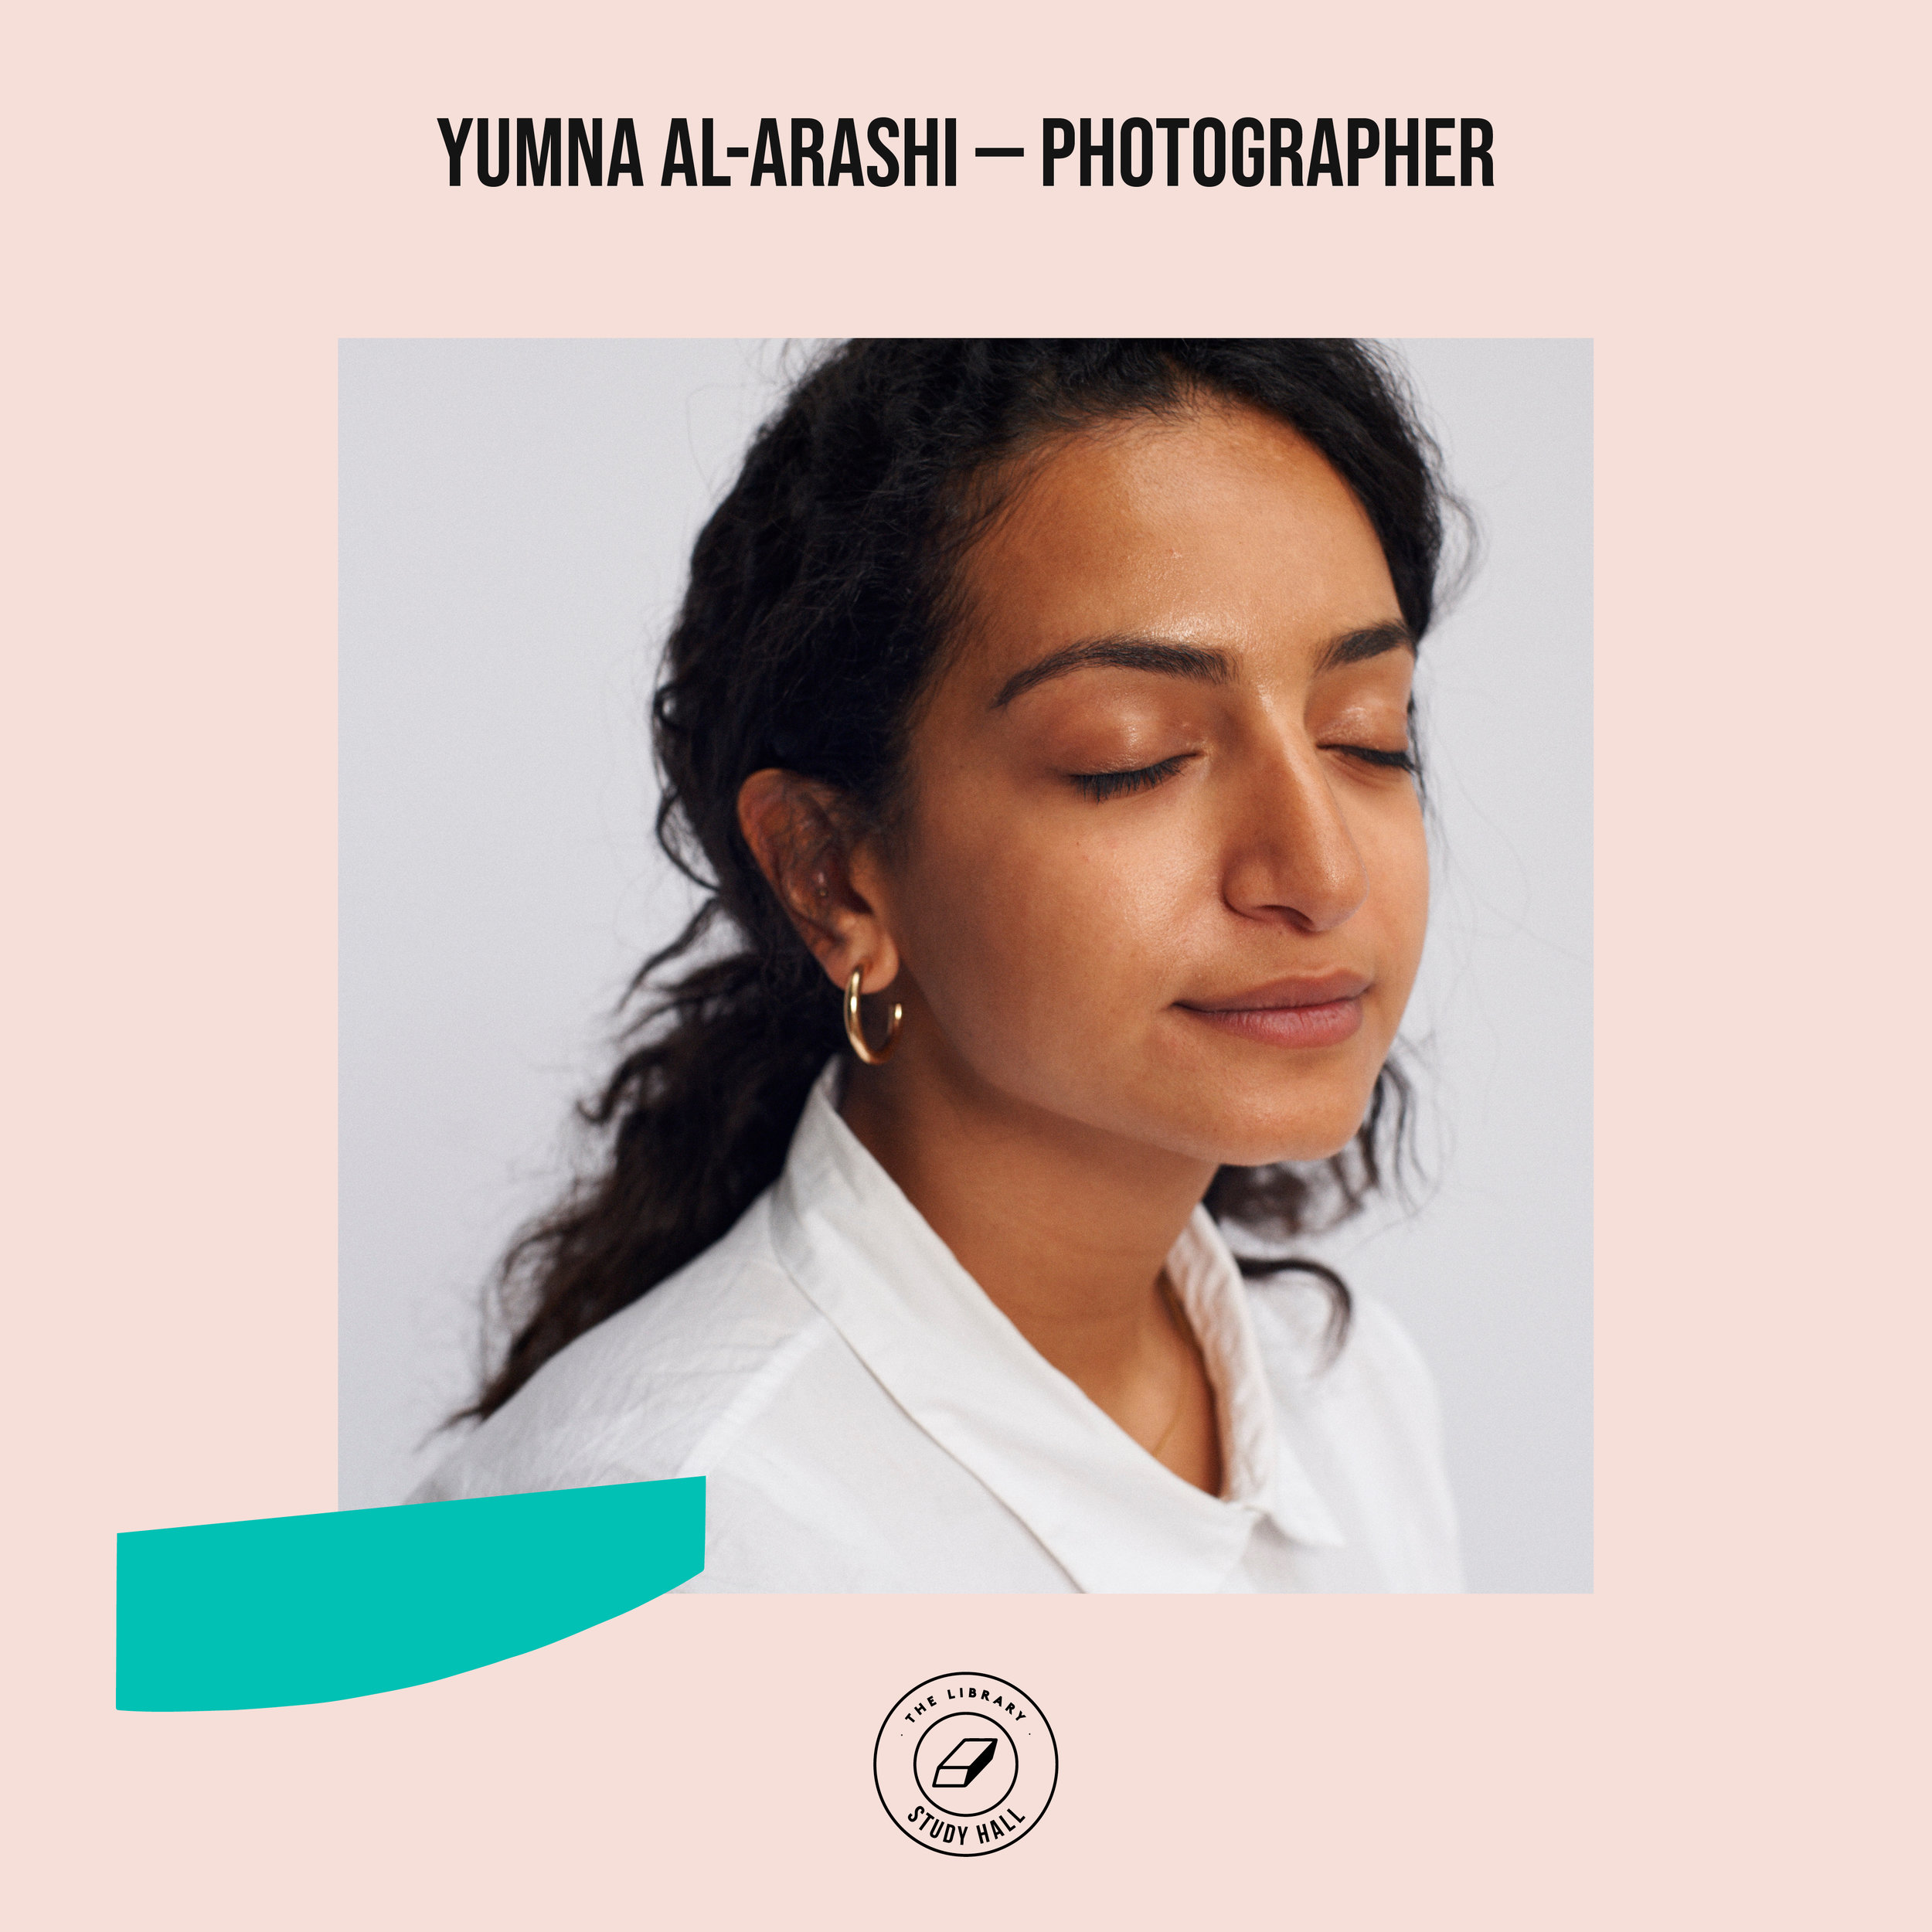 Yumna Portrait.jpg